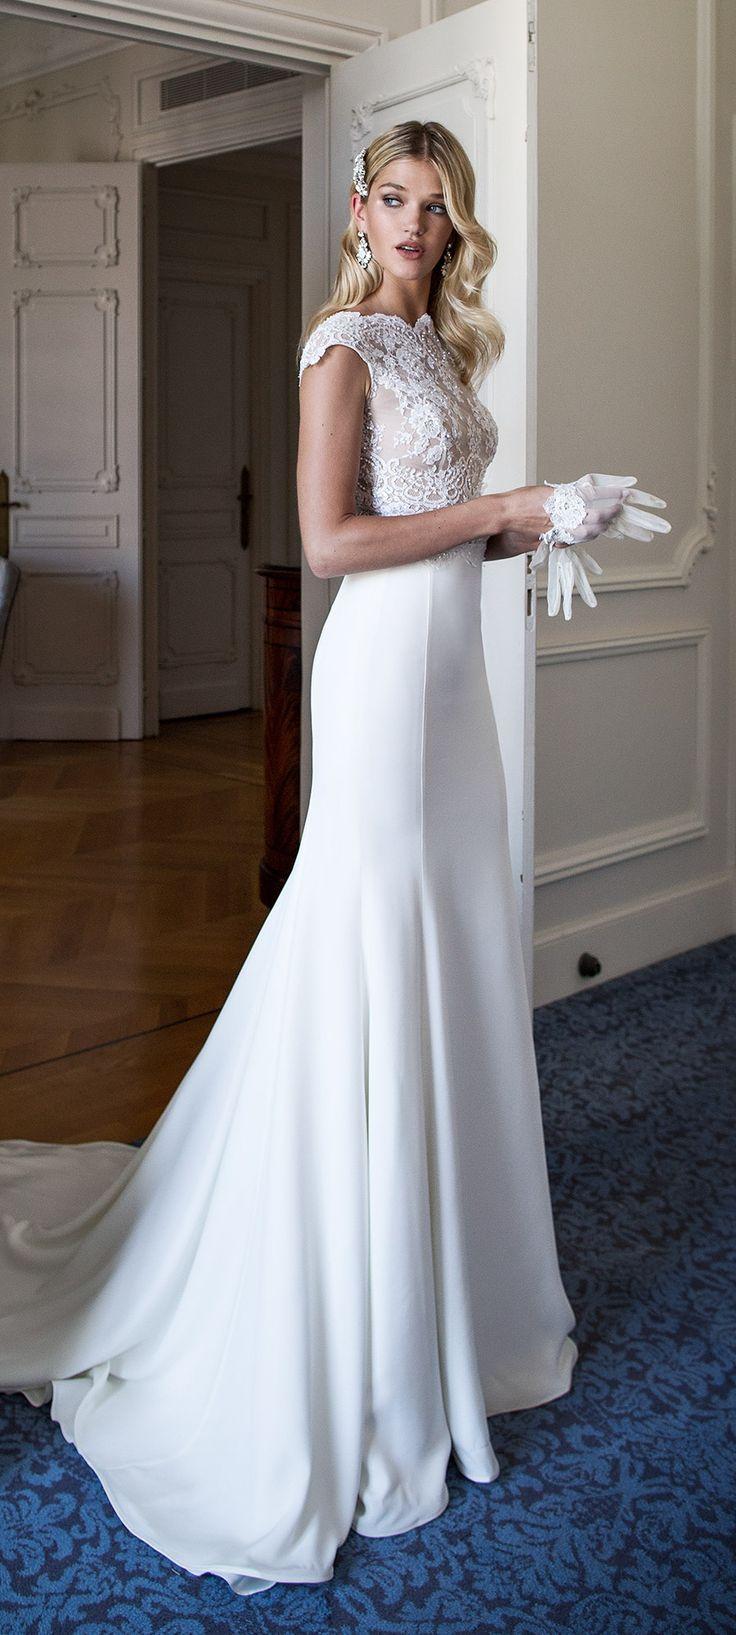 BLETILLA by Alessandra Rinaudo. An incredibly elegant contemporary wedding dress with cap sleeve lace  bodice. #AR_2017Collection #AlessandraRinaudo #bridal #wedding #ad #weddingdress #lace #romantic